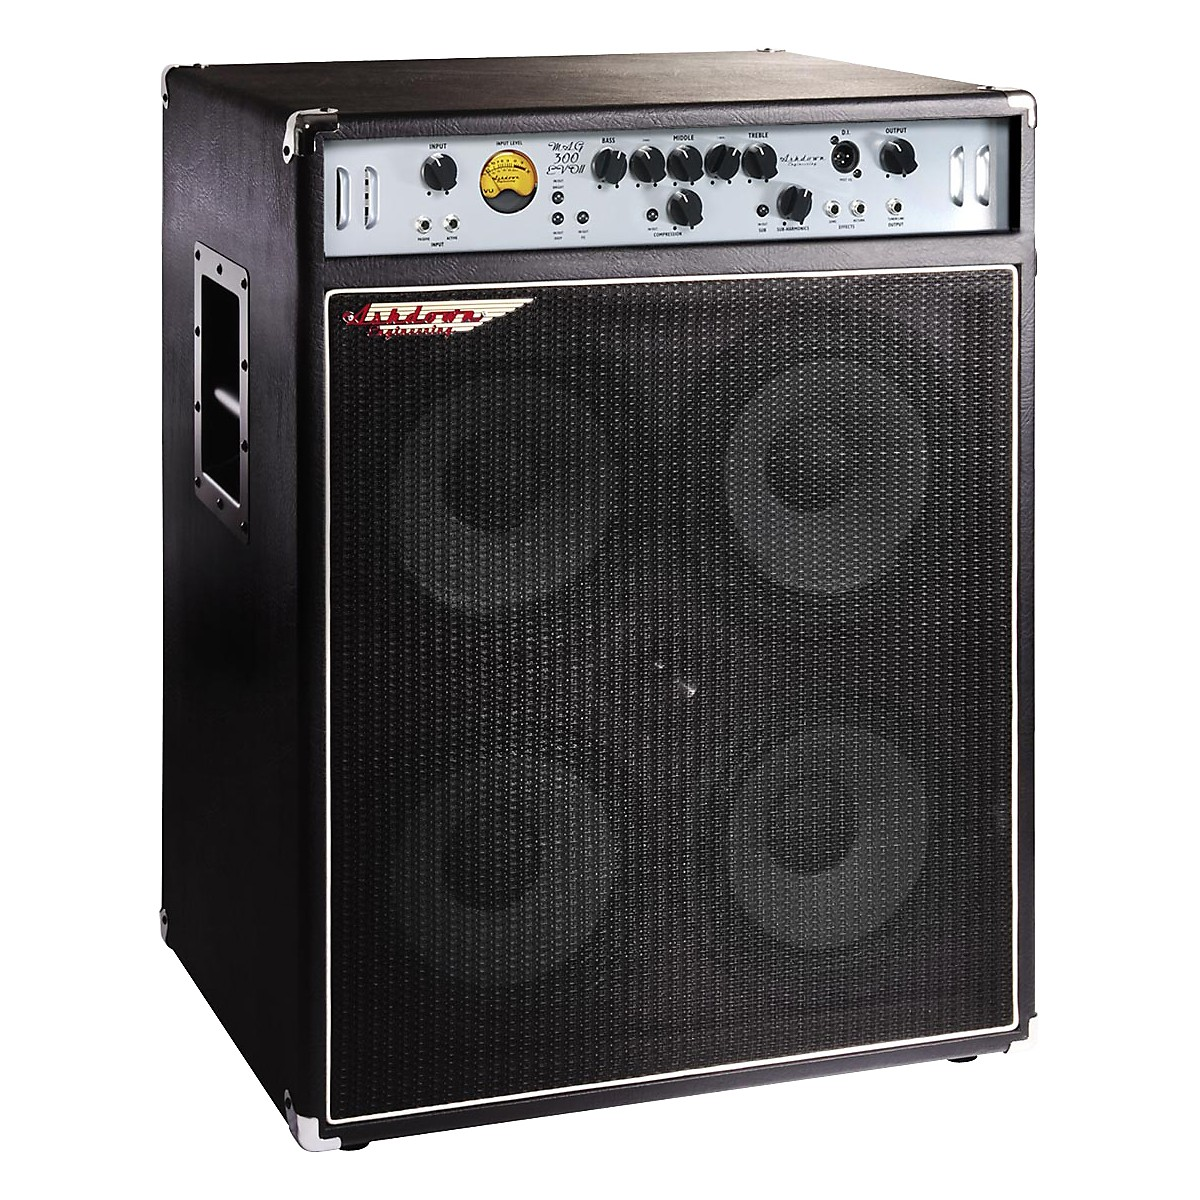 Ashdown MAG C410T-300 EVO II 300W 4x10 Bass Combo Amp